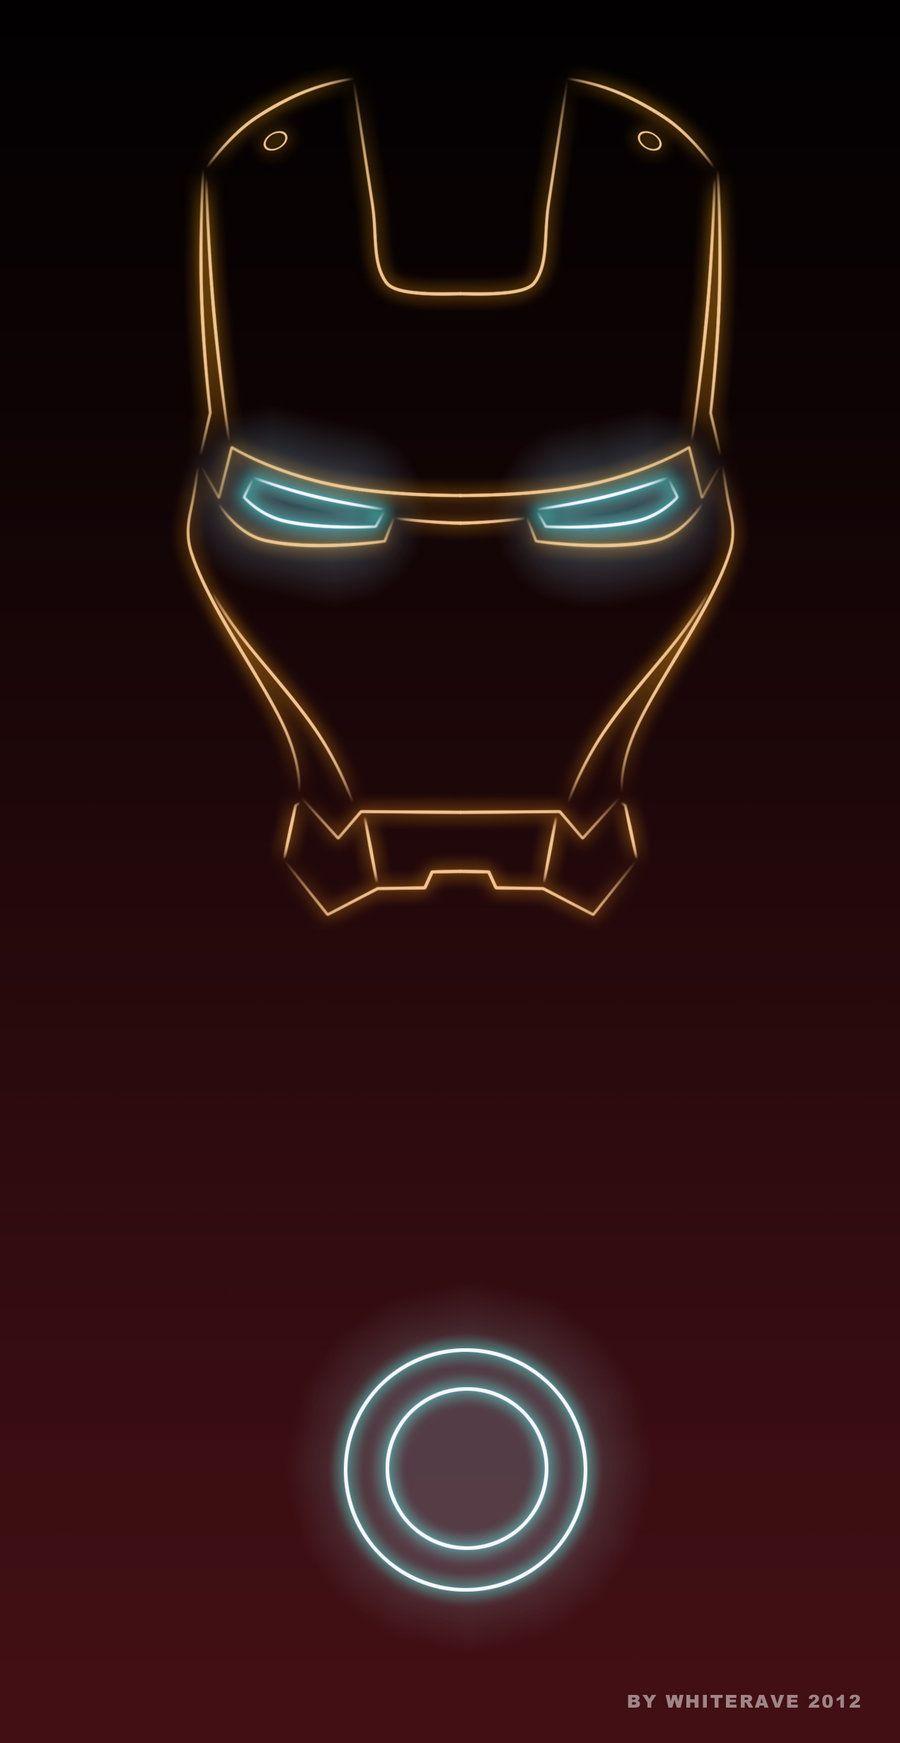 Cute Iron Man Animated Wallpaper